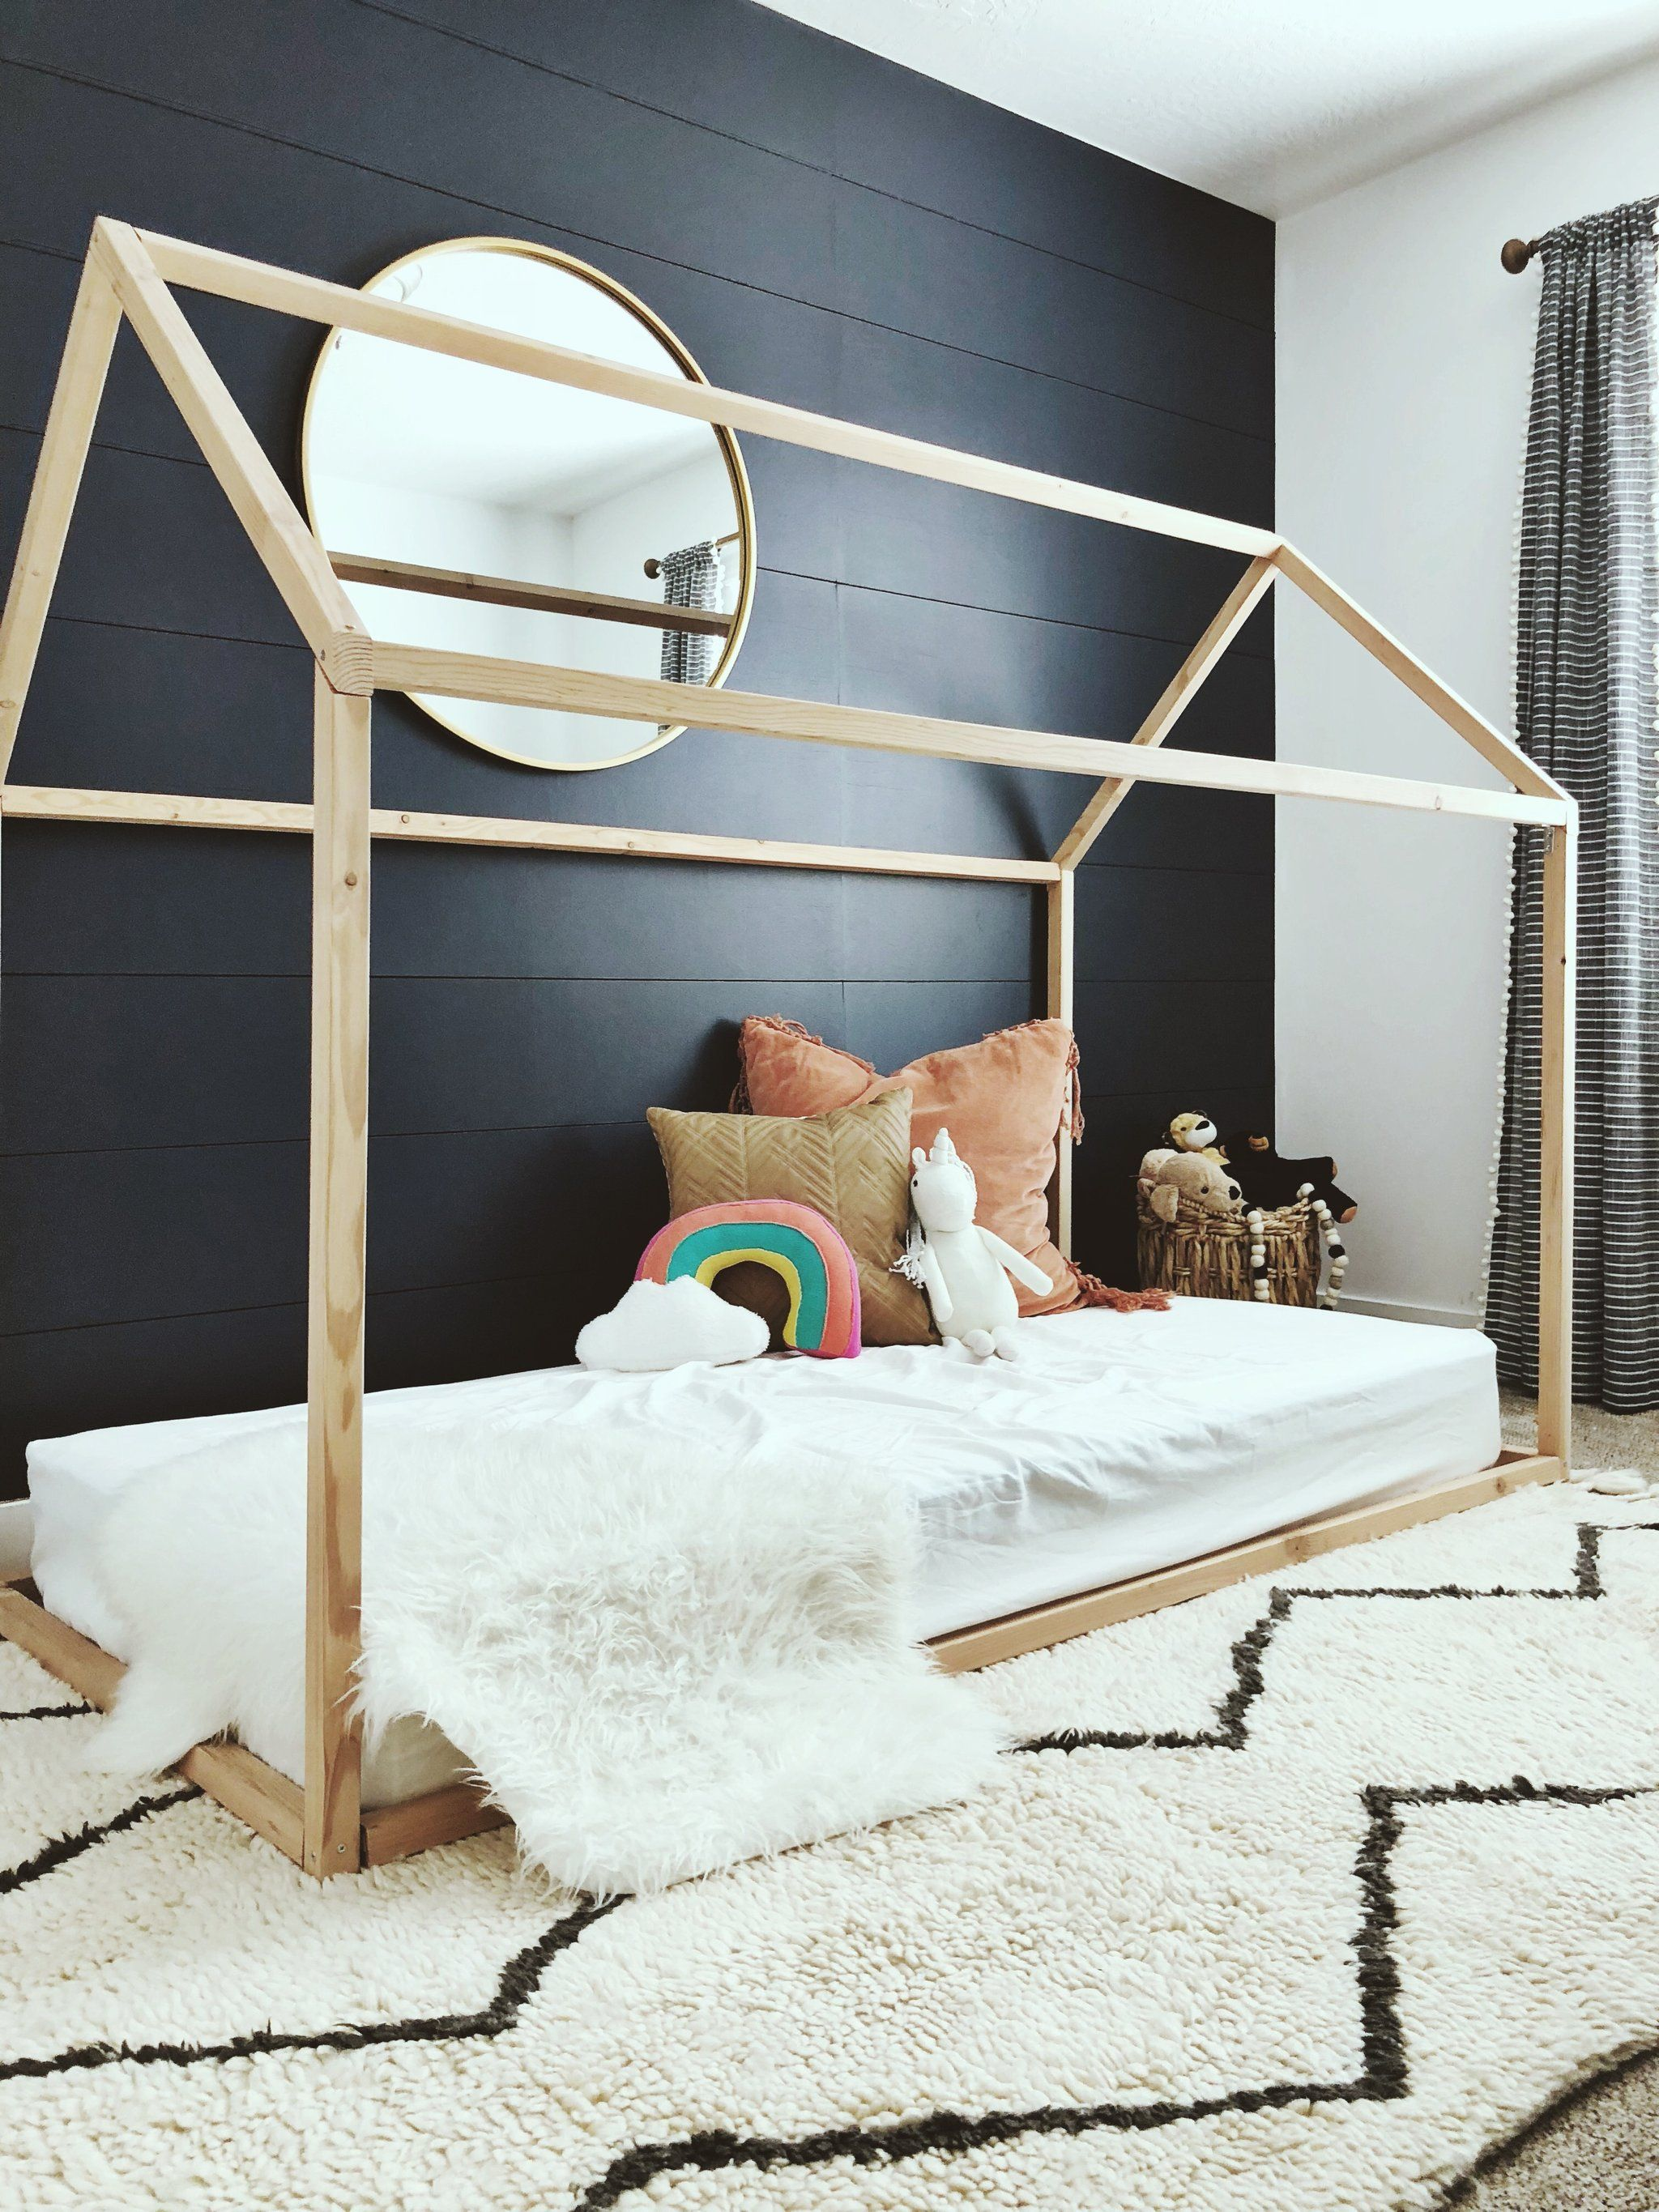 house bed for kids frame toddler montessori bedroom beds nursery print designs